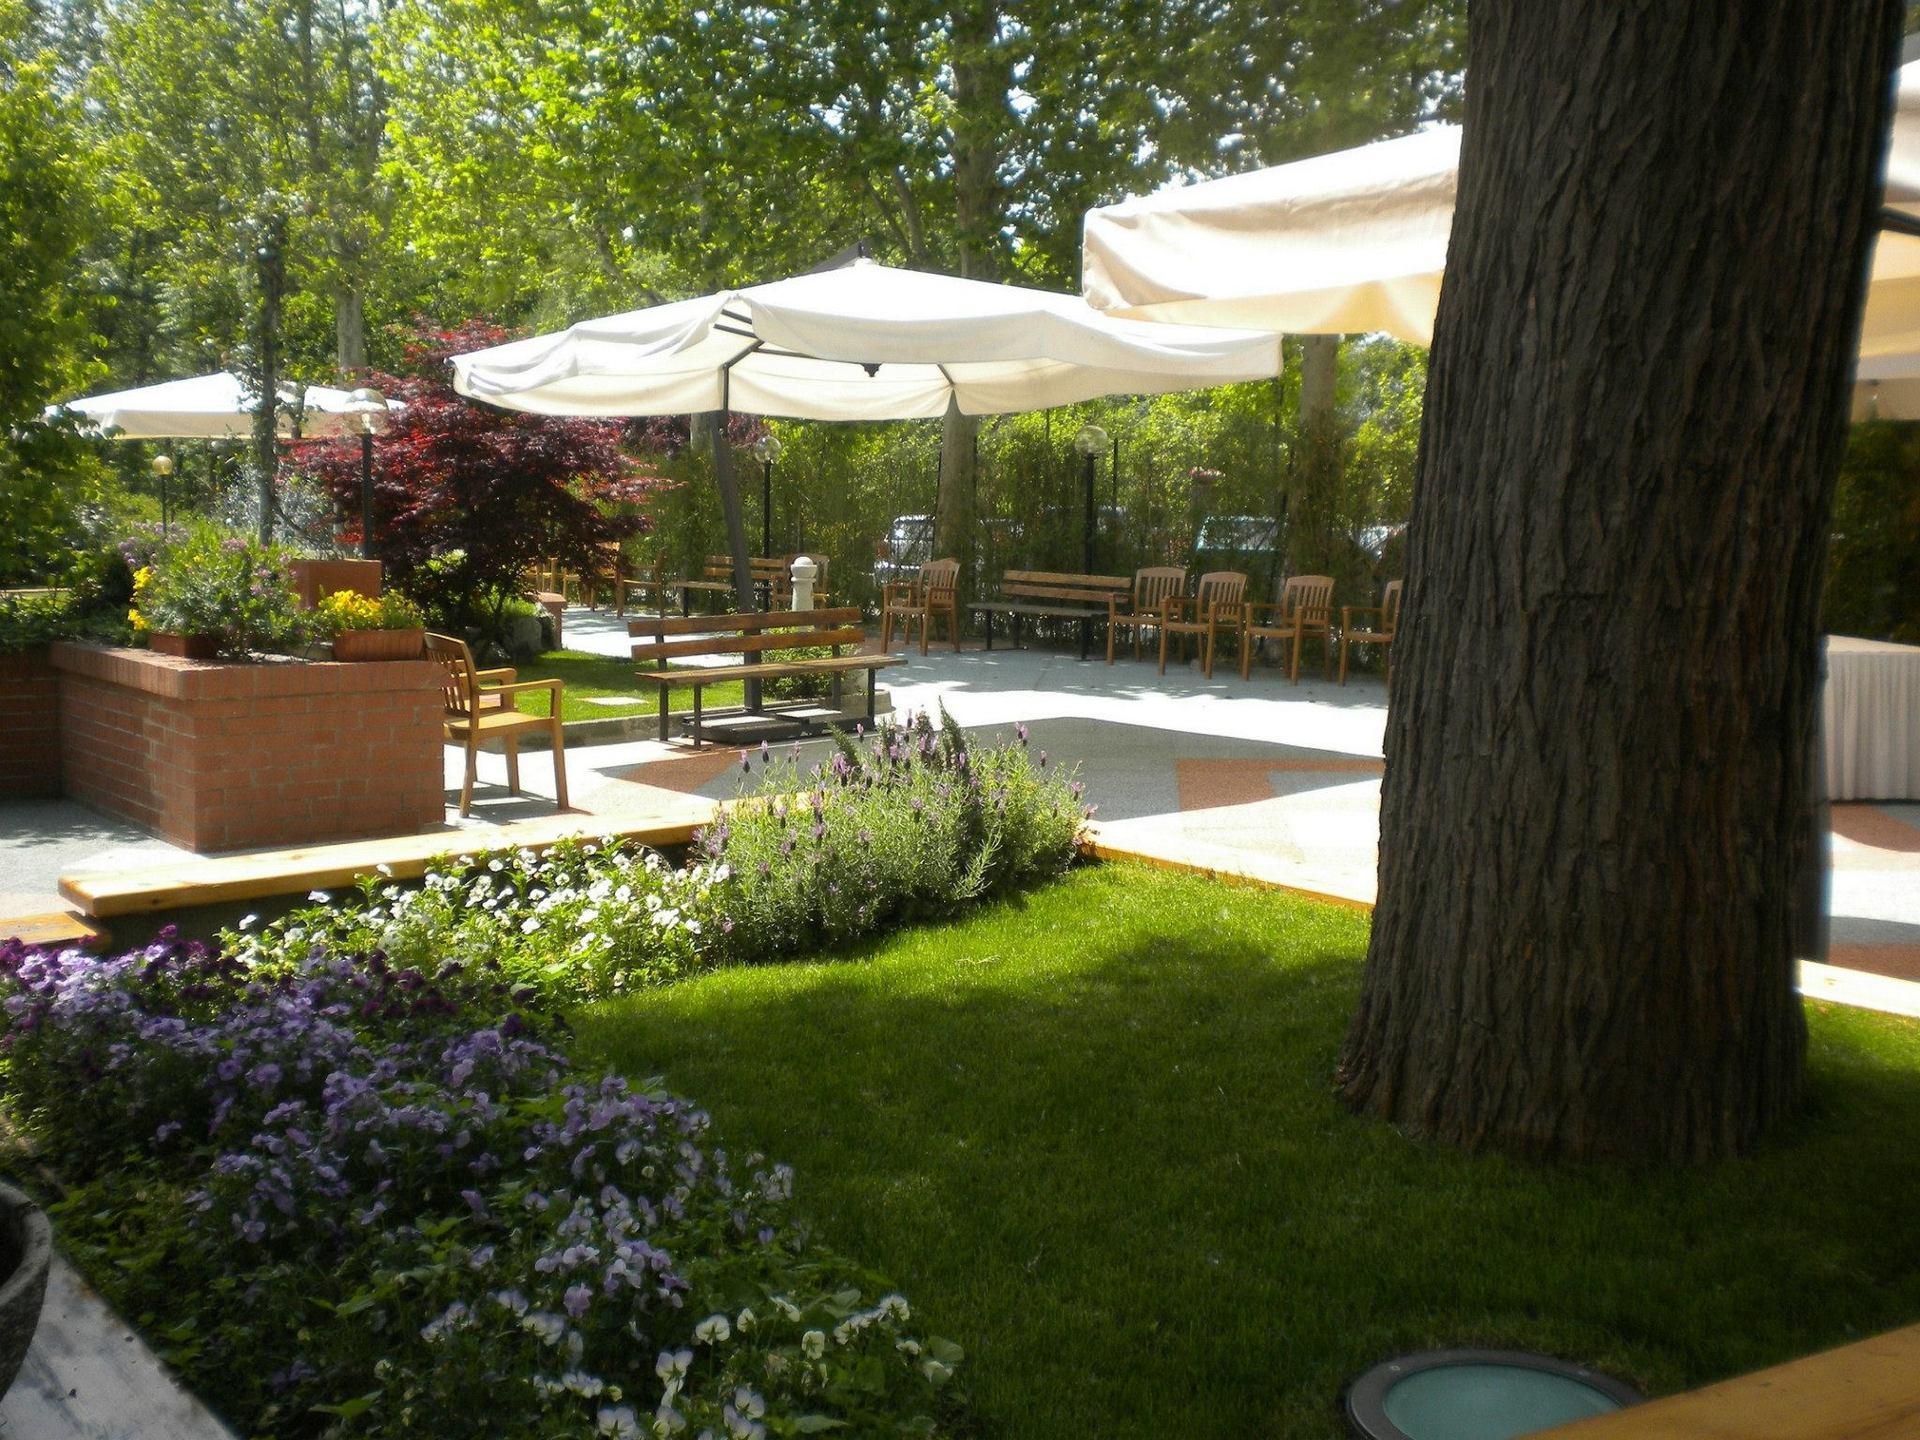 sala esterna del ristorante con giardino